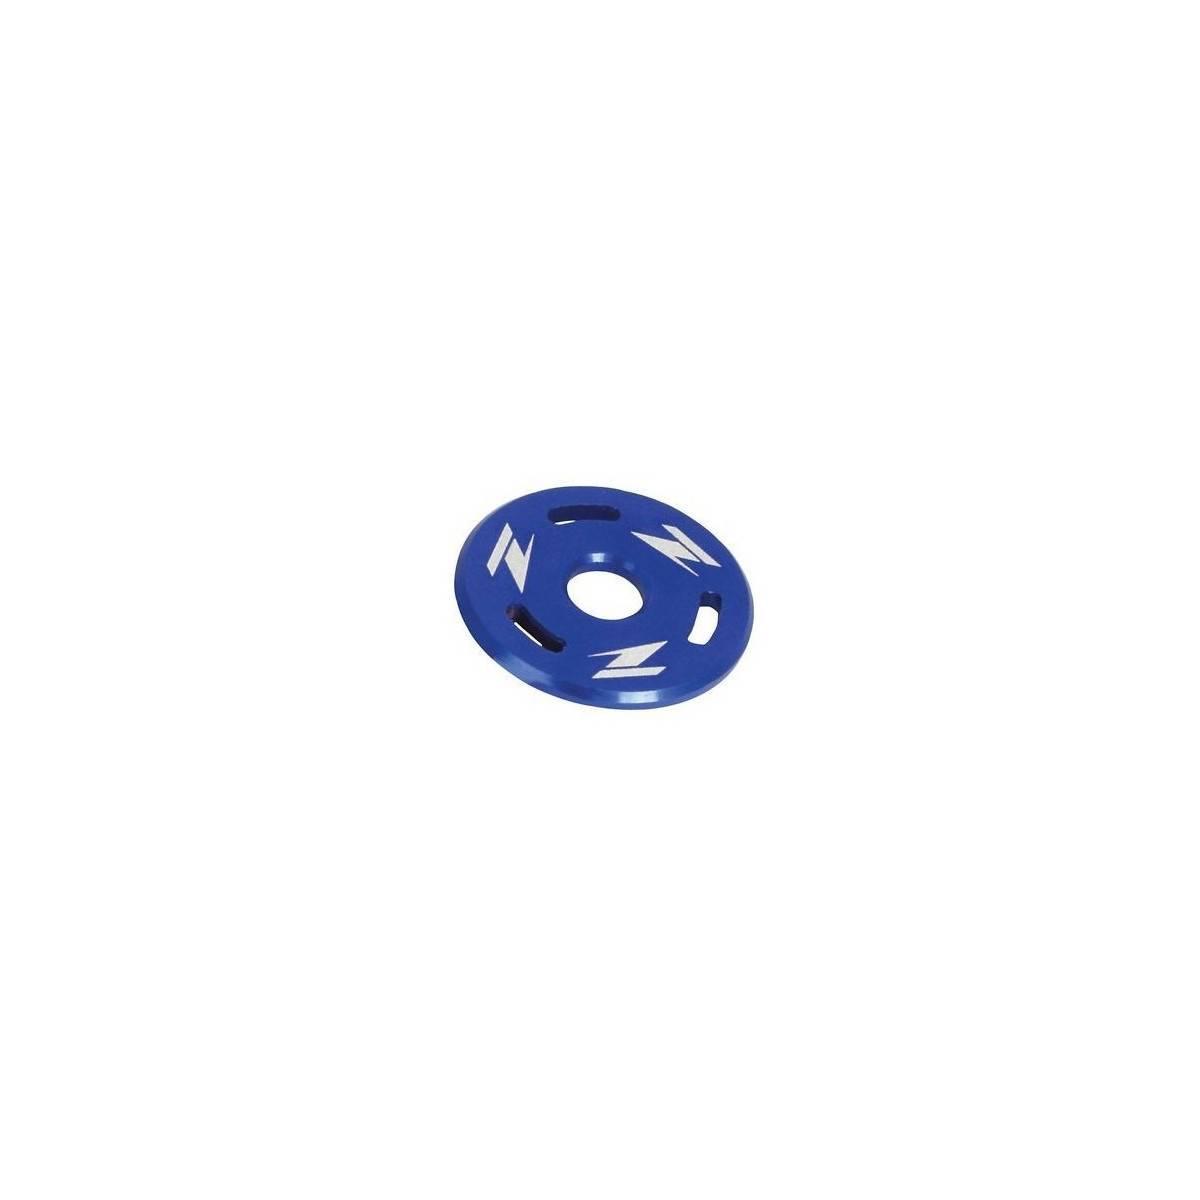 ZE88.2004 - Tuerca Deposito Yamaha Yzf´06-09 Azul